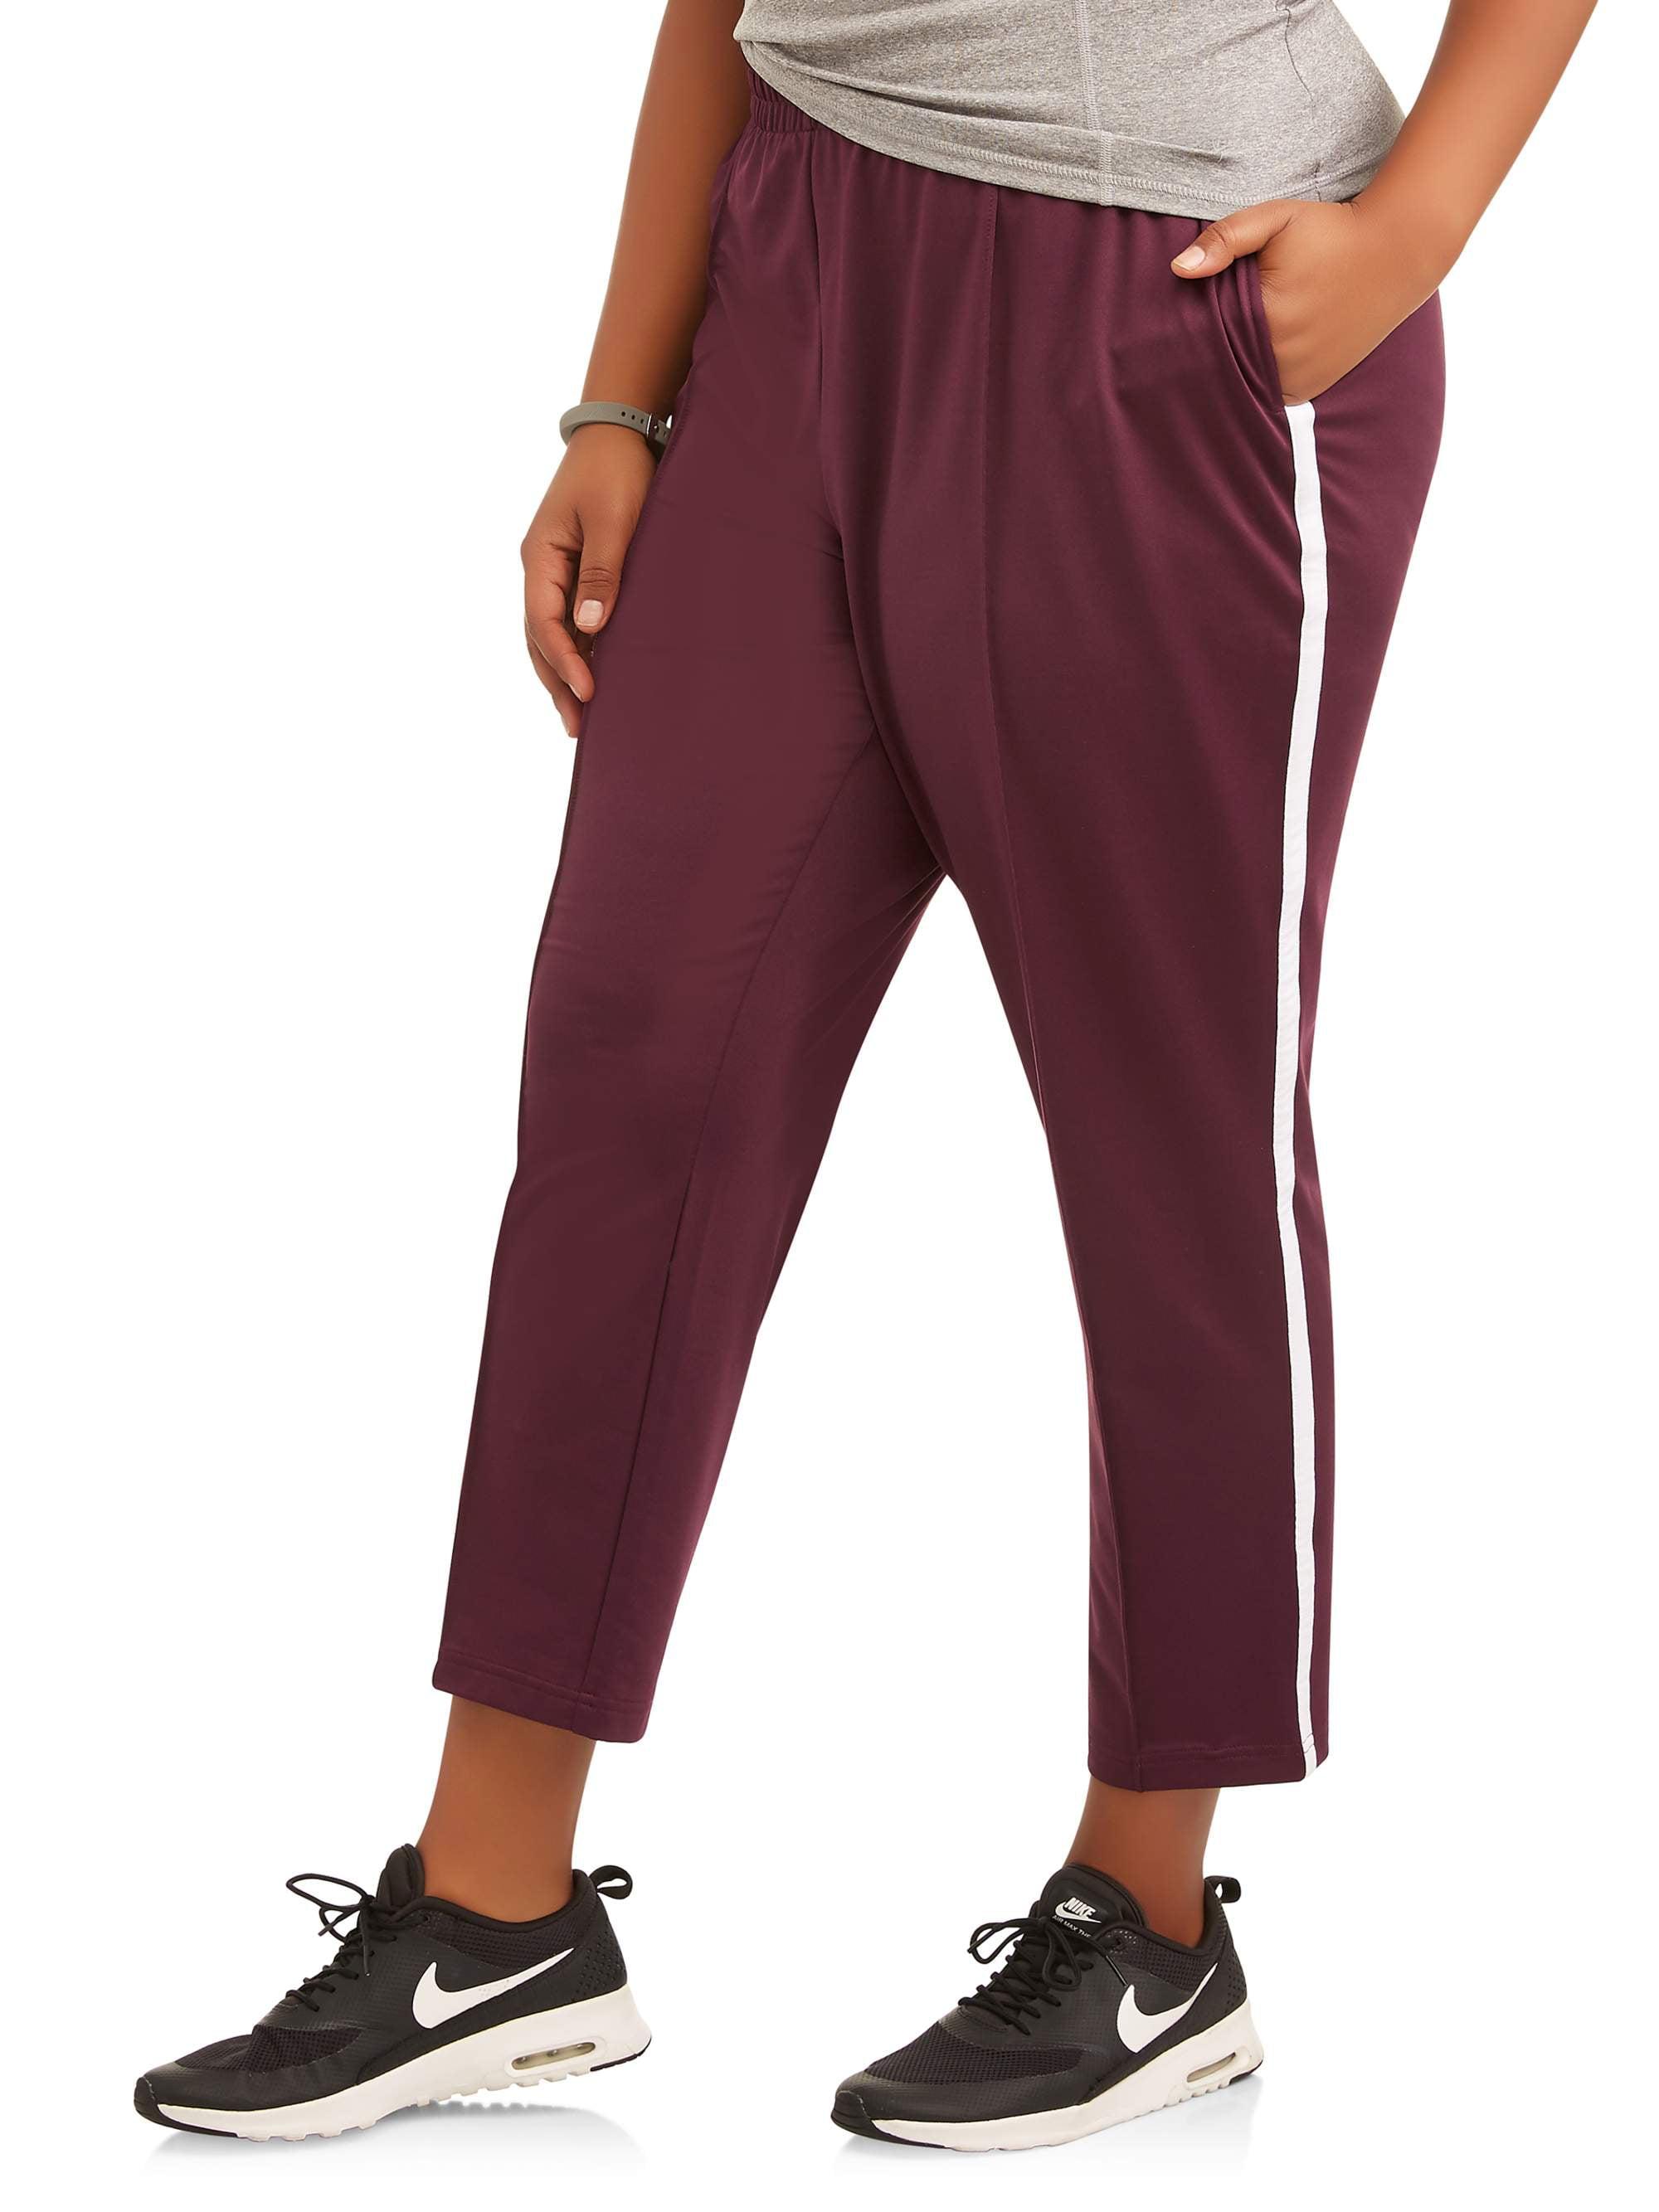 Athletic Works - Athletic Works Women's Plus Active Track Pant -  Walmart.com - Walmart.com